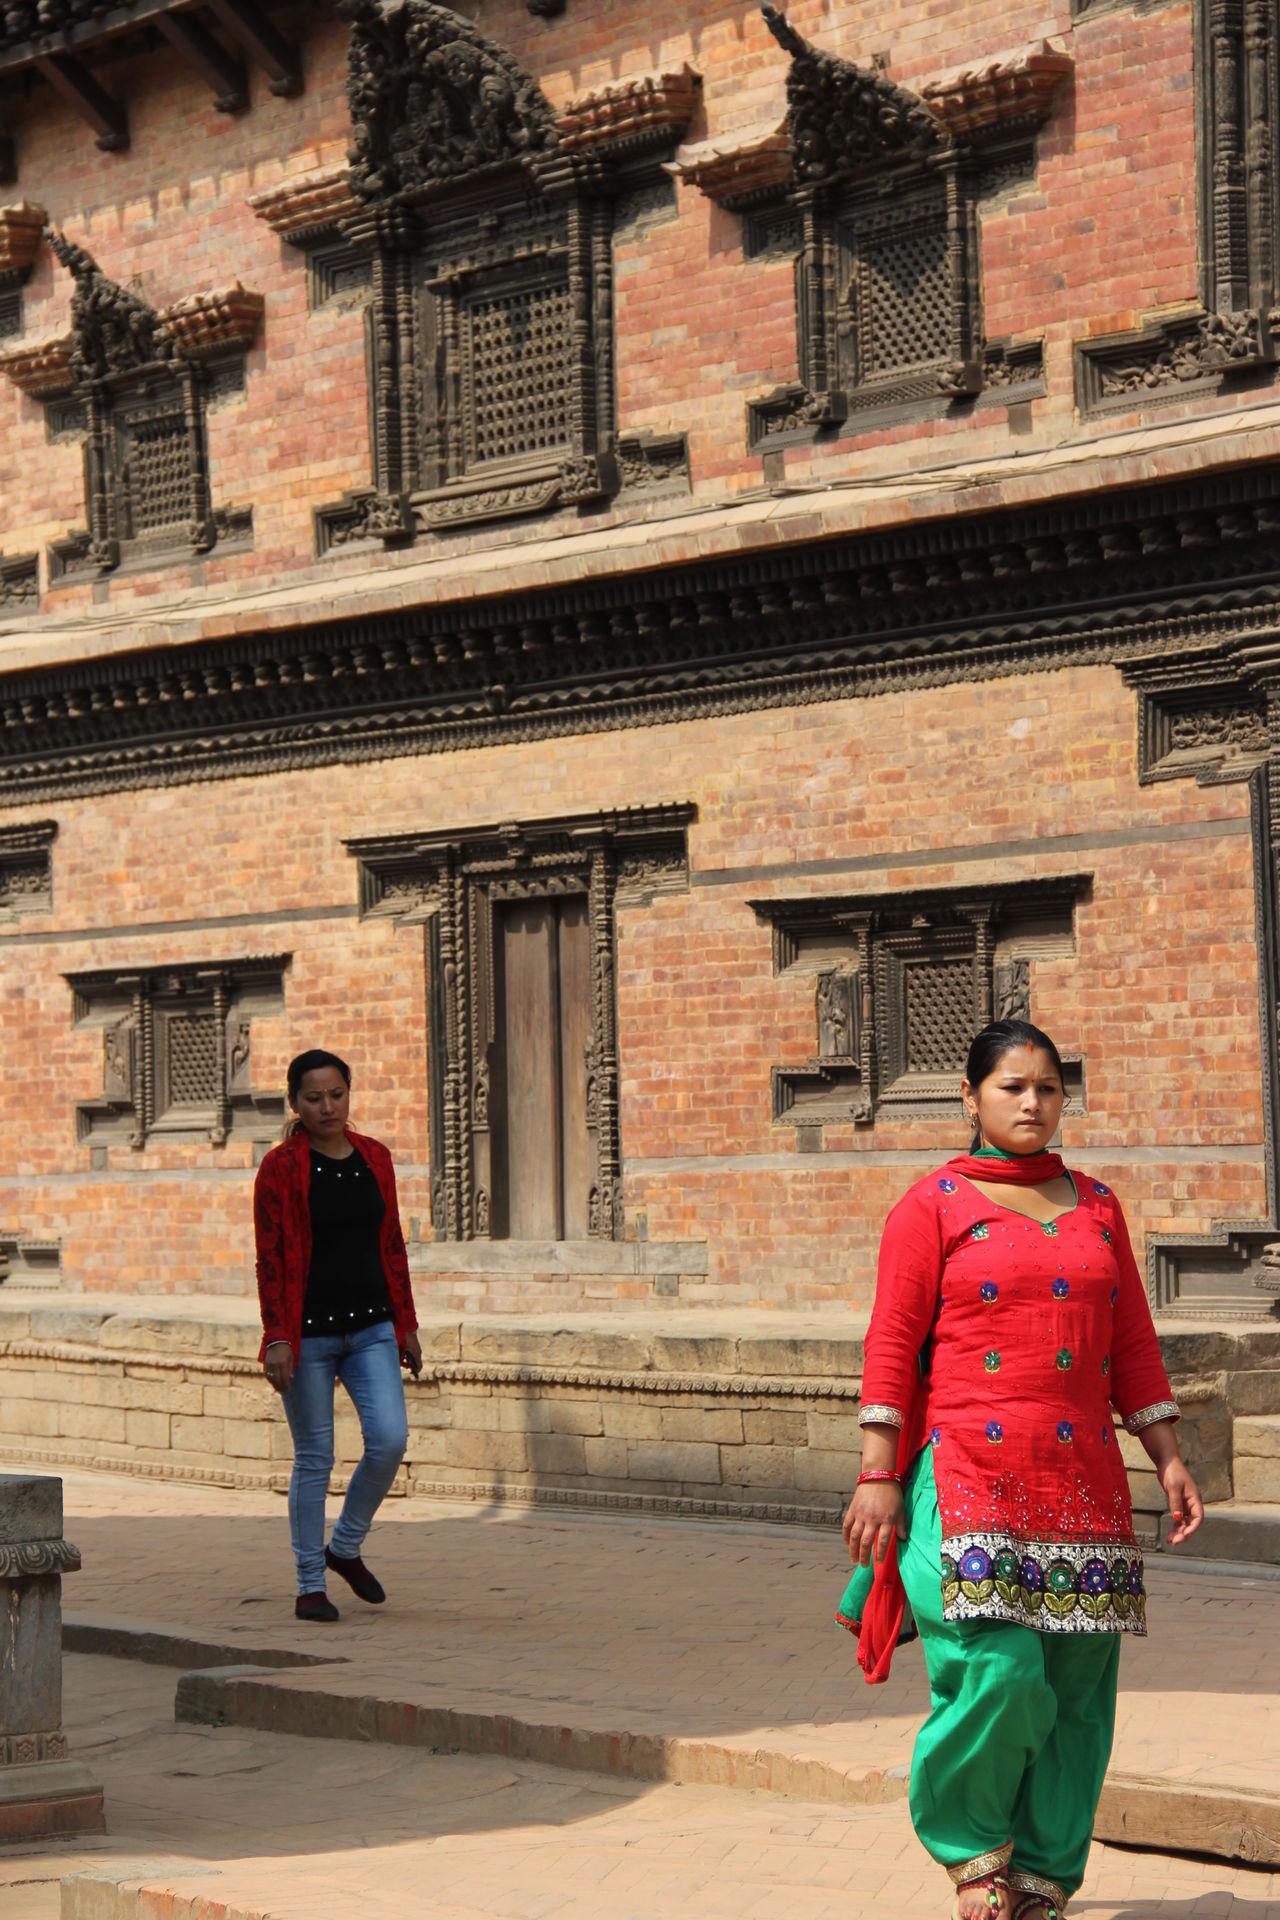 Two People Traditional Clothing Nepalipeople😊 Street Walking Women Beautiful Woman nepal travel